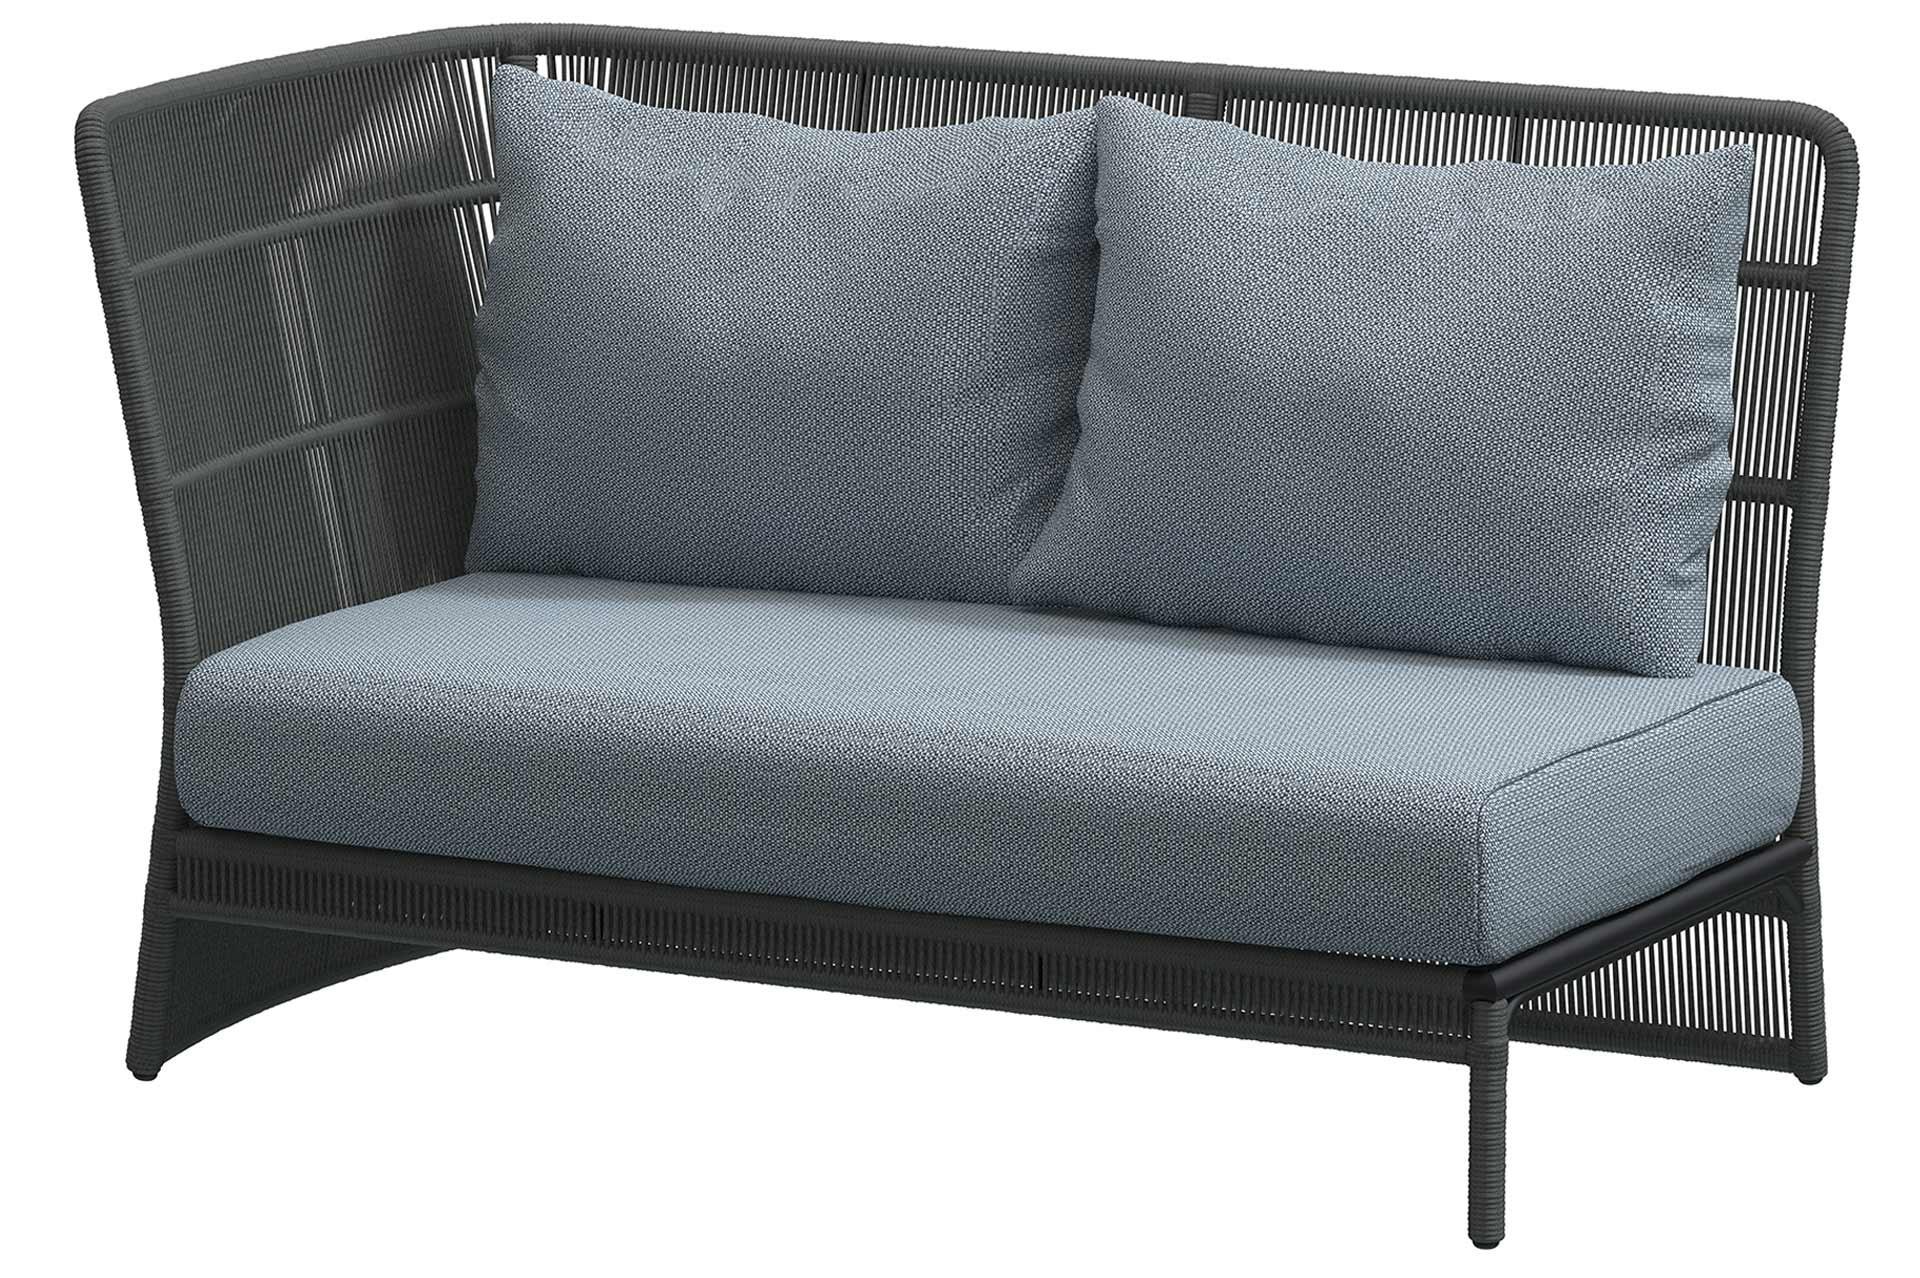 Oriënt Modular 2 seater right arm Platinum with 3 cushions